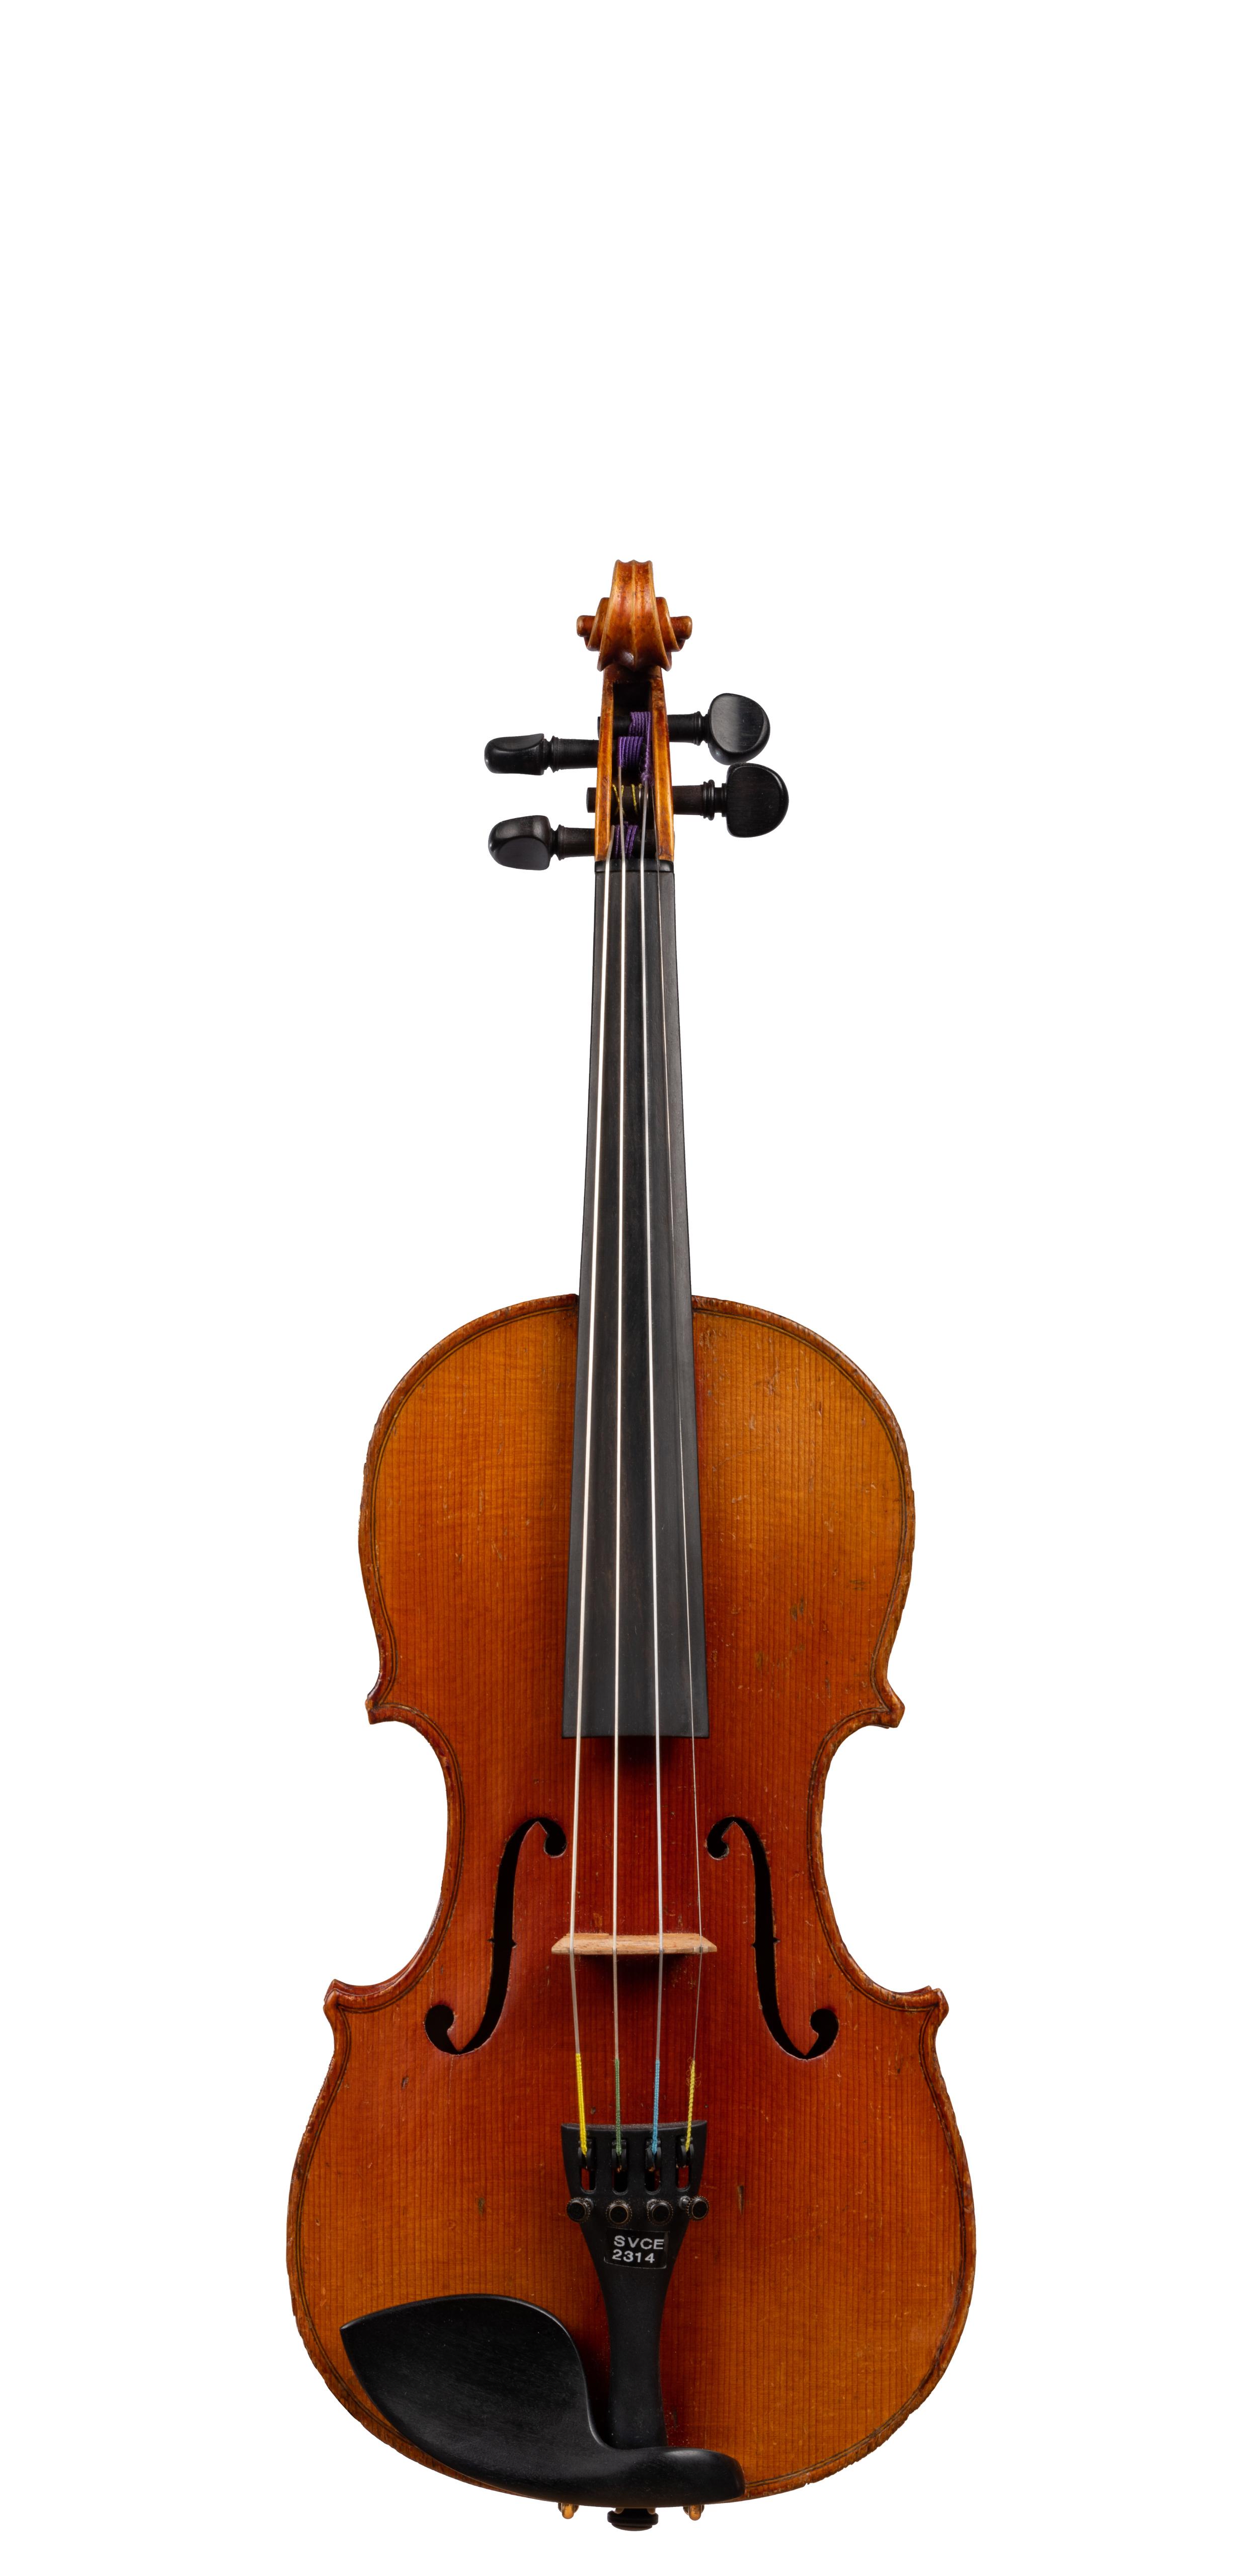 A German 1/4 Violin from Markneukirchen, ca 1920 -